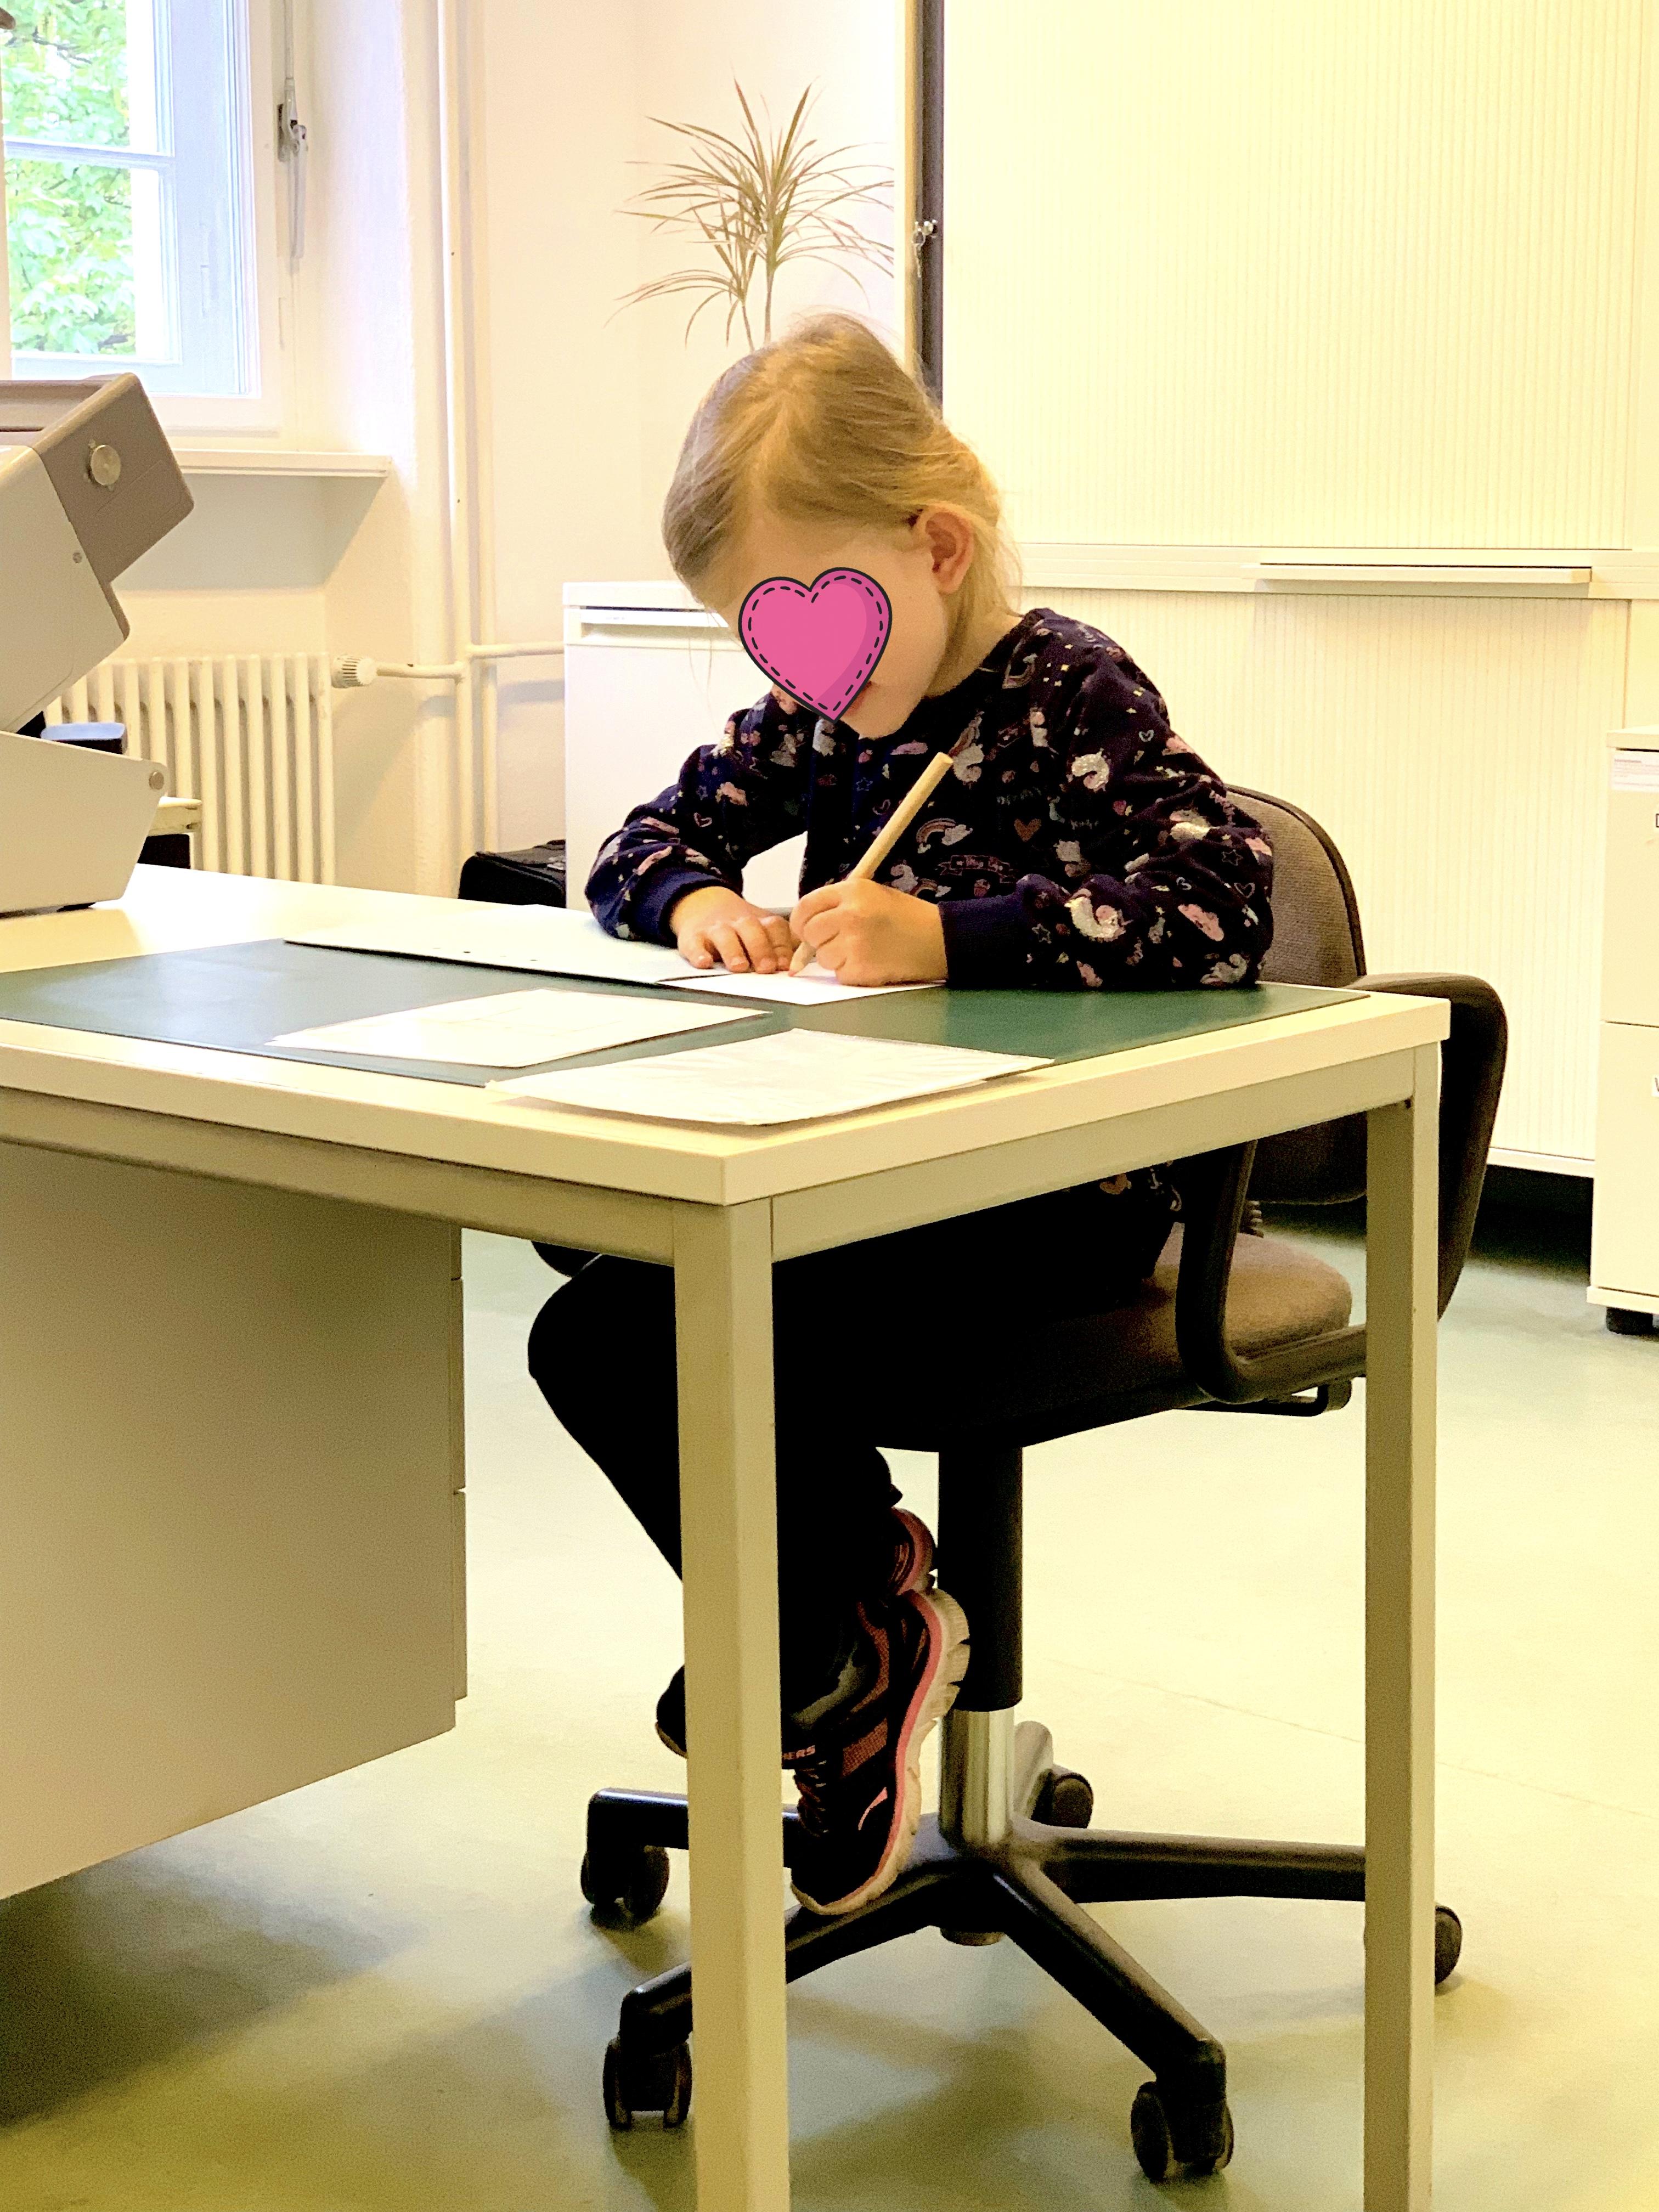 10 schuluntersuchung Junge Mädchen